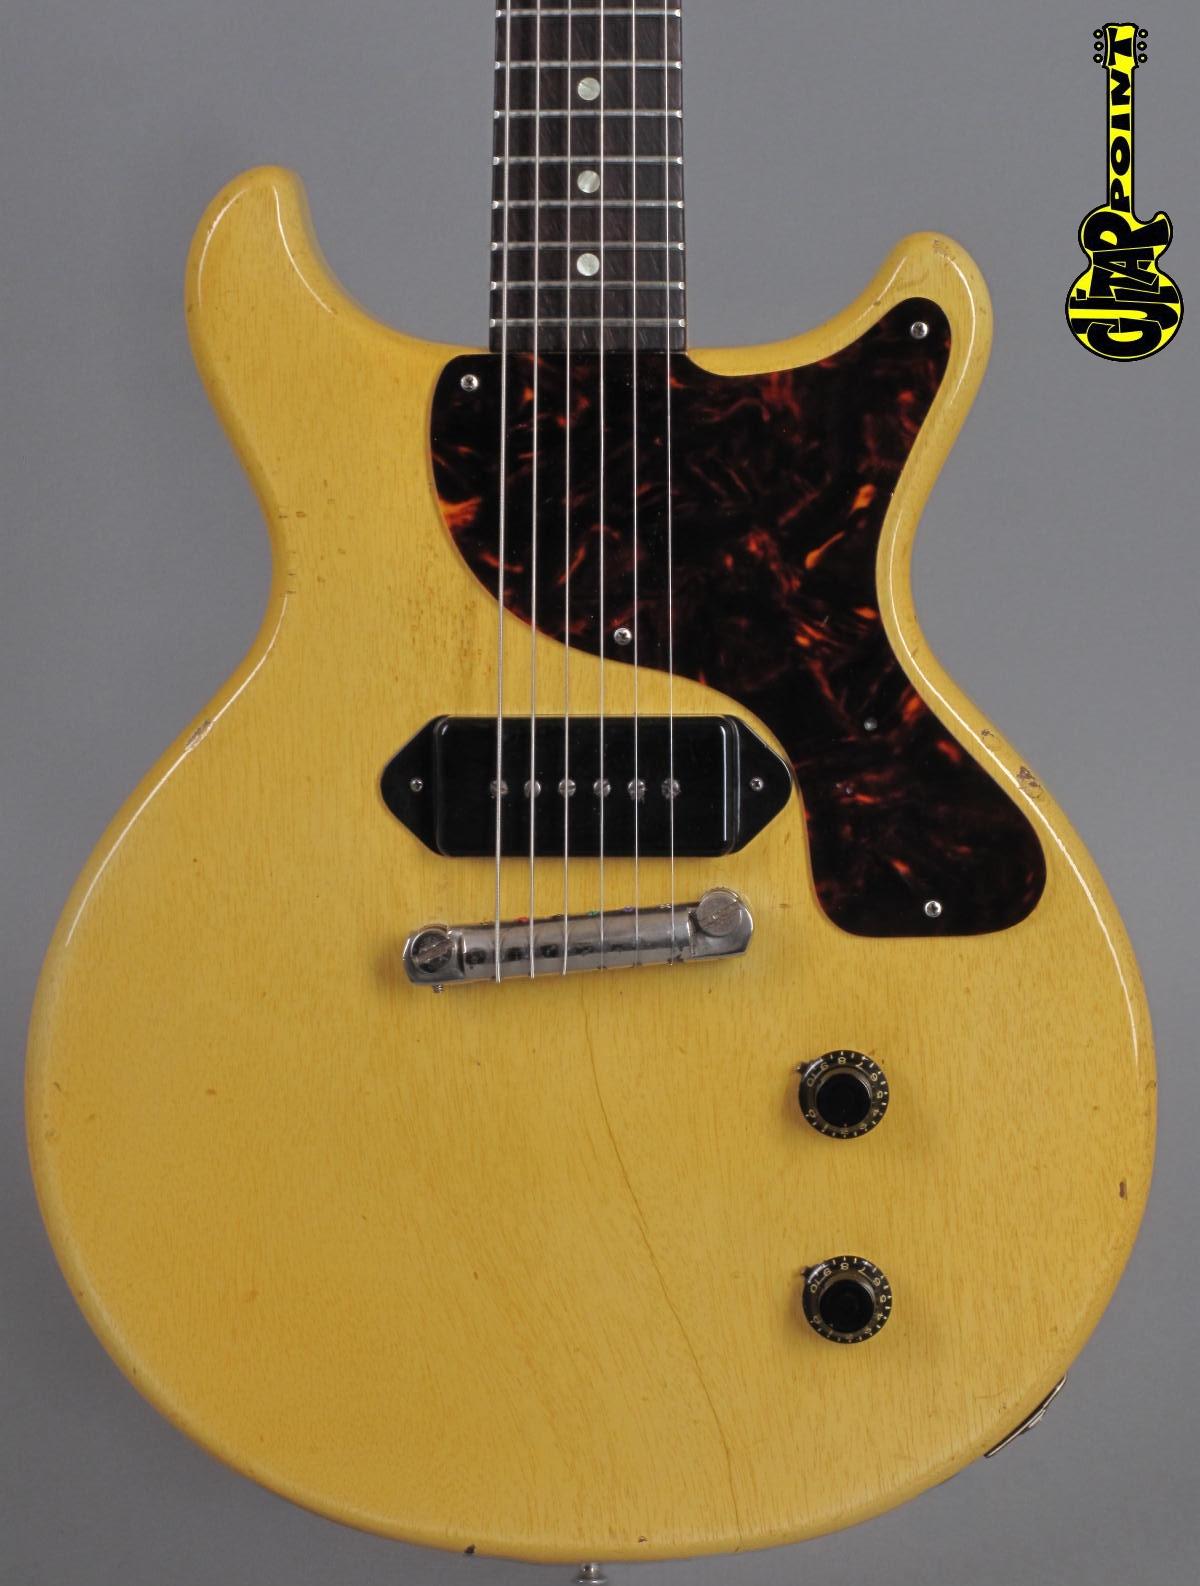 1959 Gibson Les Paul Junior DC - TV-Yellow